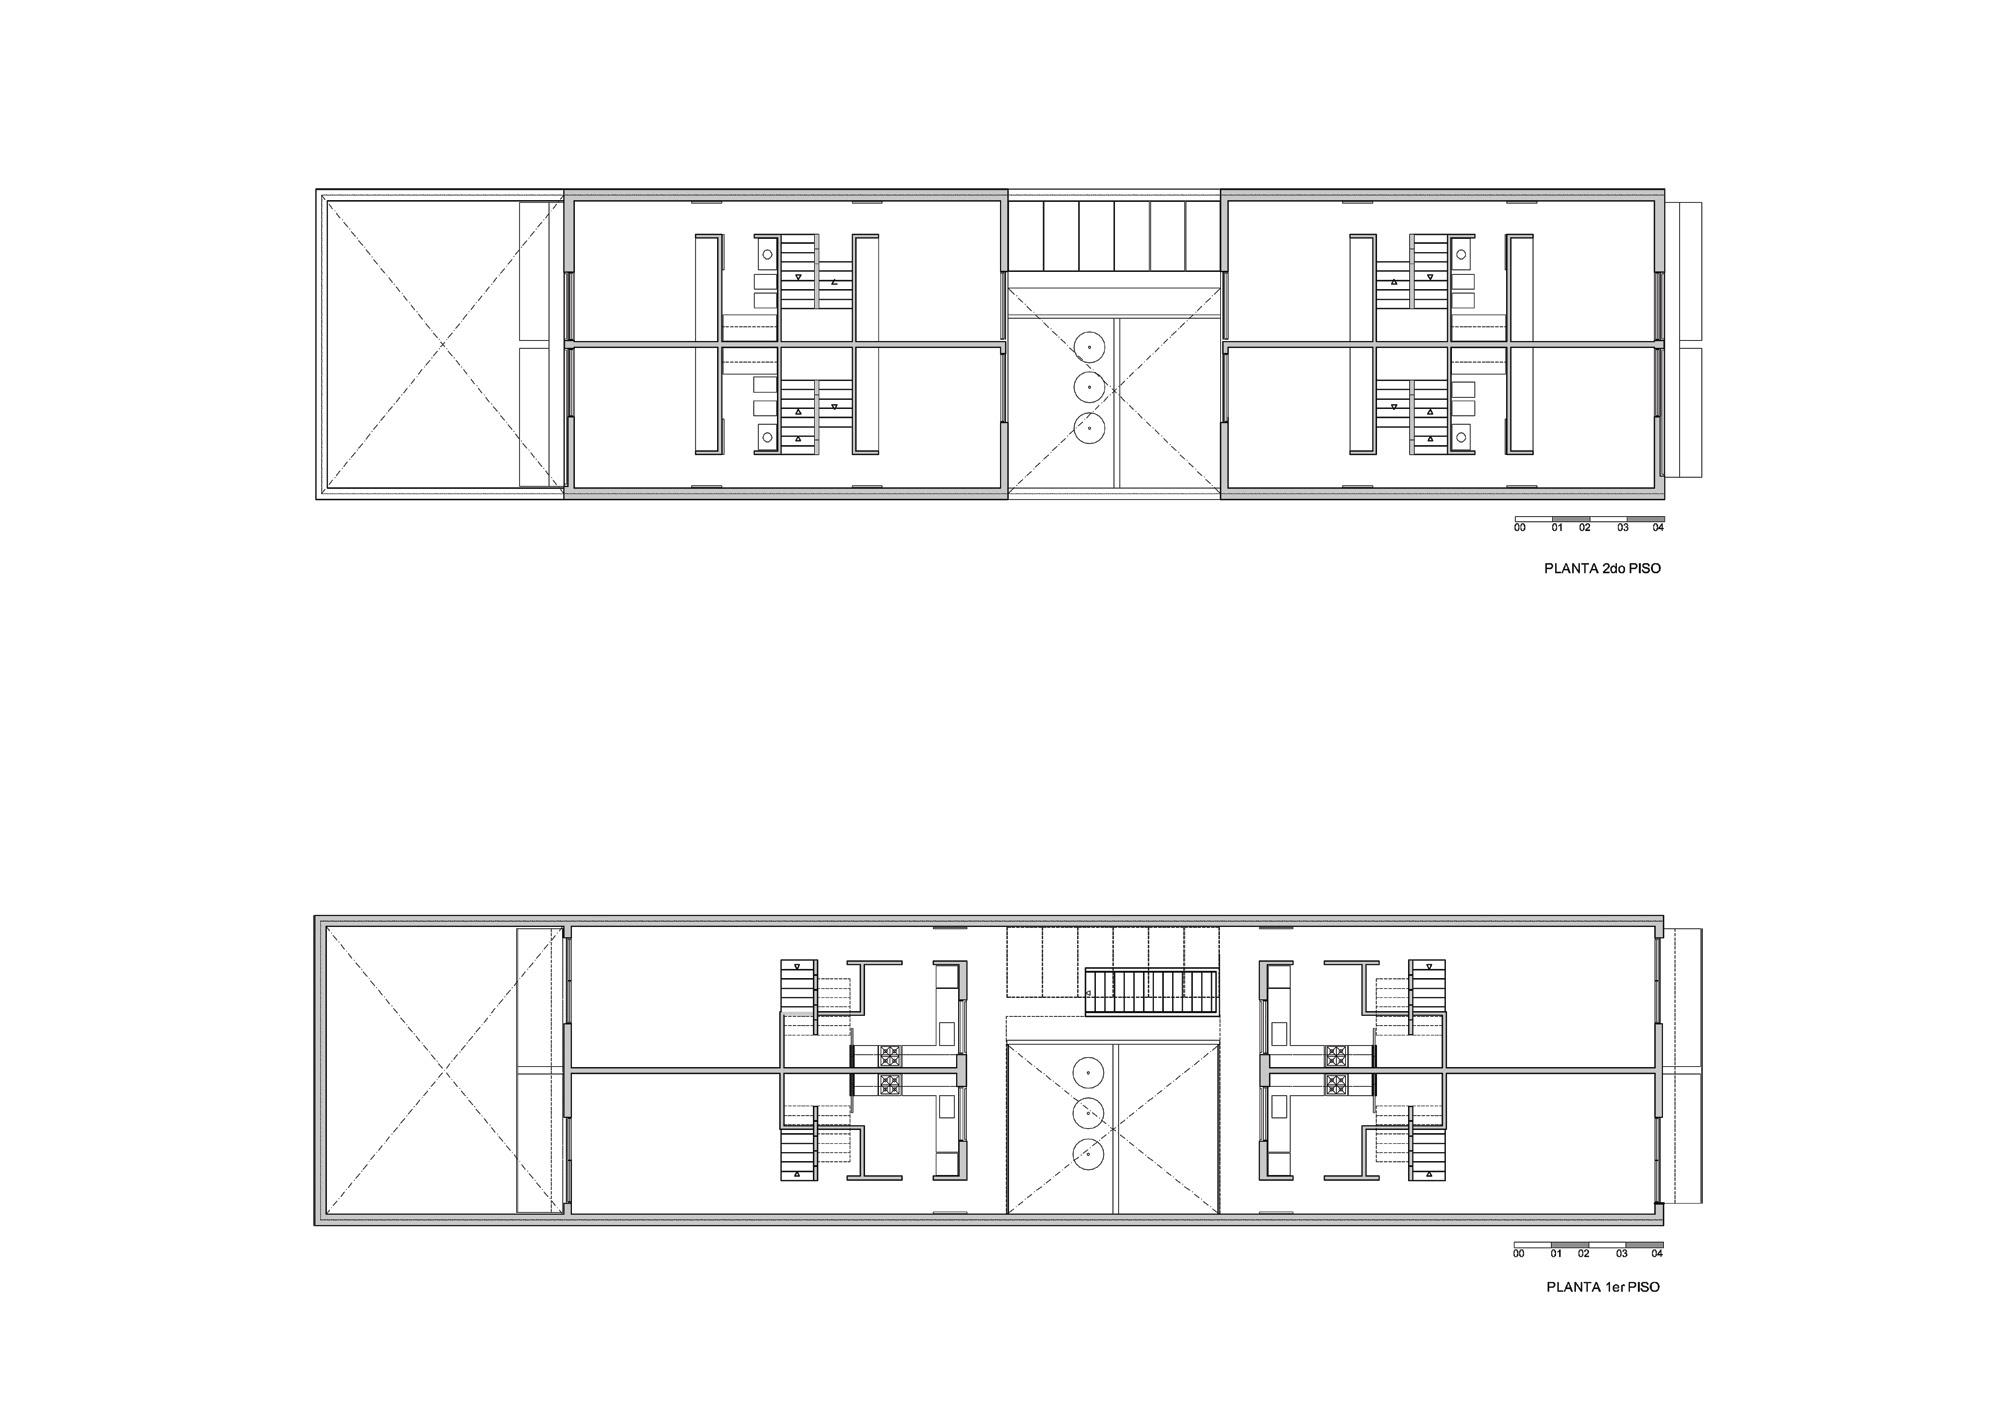 Vivienda Colectiva, Edificio Argerich - Daniel Ventura, arquitectura, casas